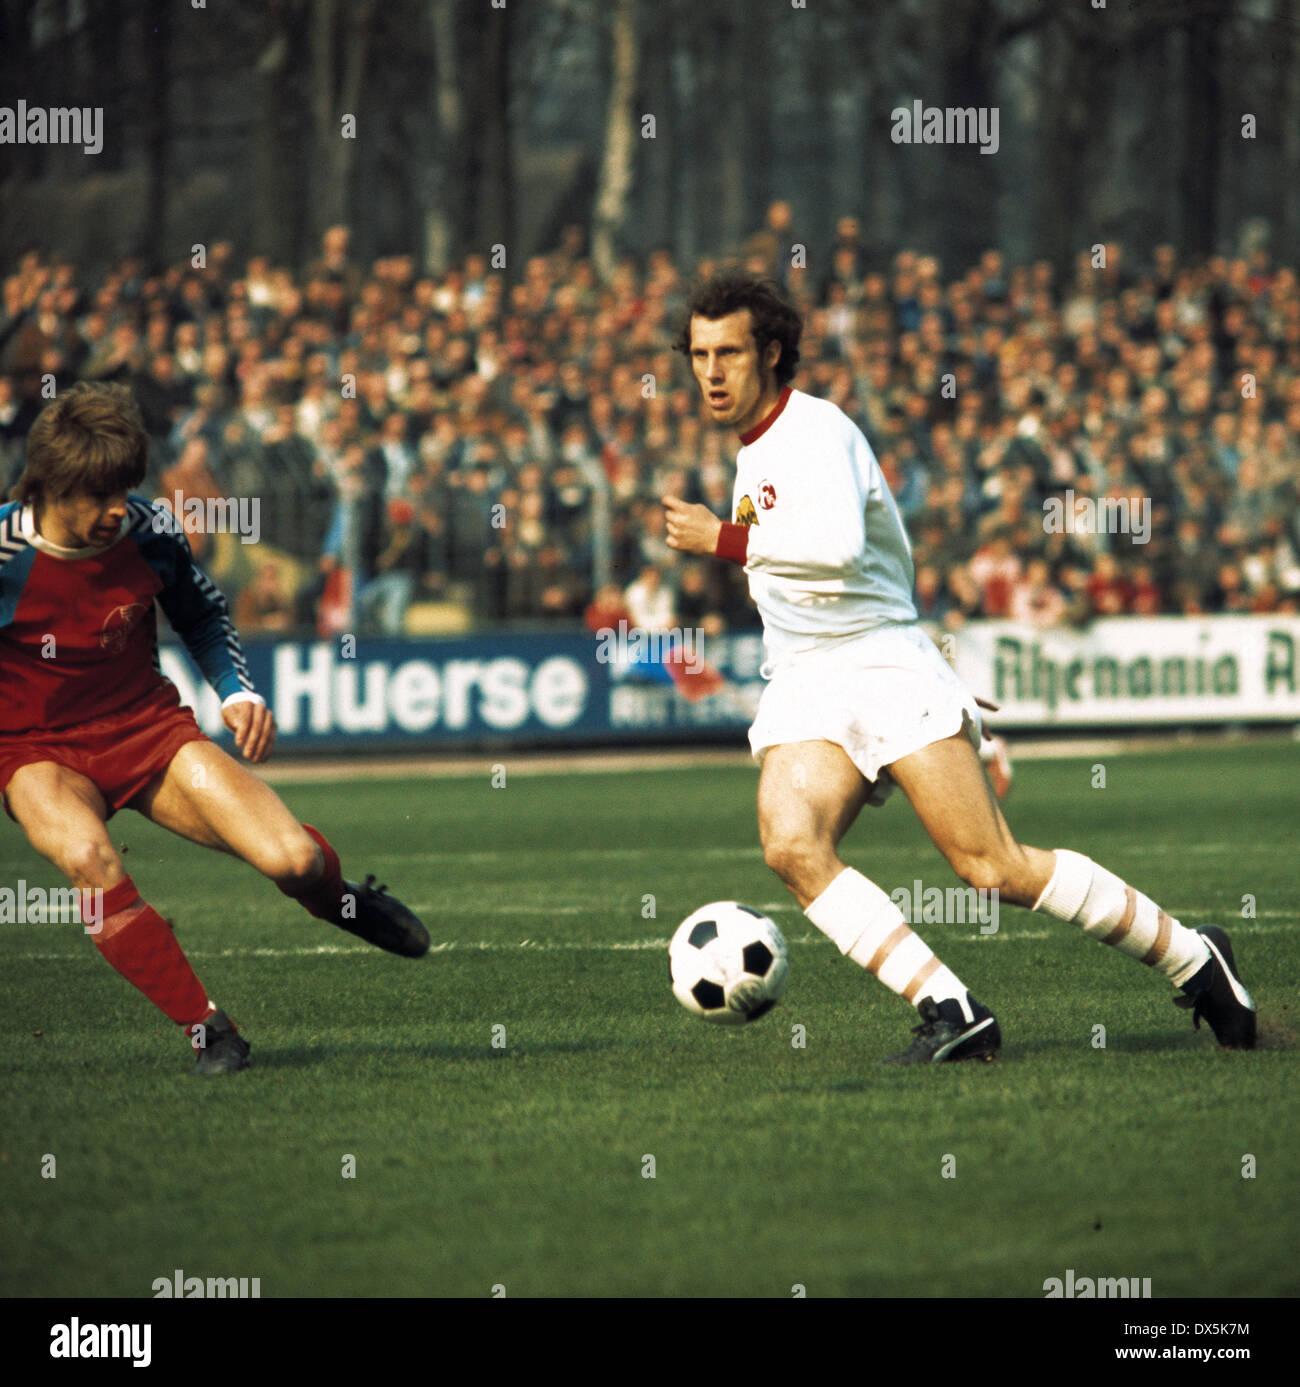 football, Bundesliga, 1975/1976, Grotenburg Stadium, FC Bayer 05 Uerdingen versus Fortuna Duesseldorf 2:0, scene of the match, Norbert Brinkmann (05) left and Jan Mattsson (Fortuna) - Stock Image